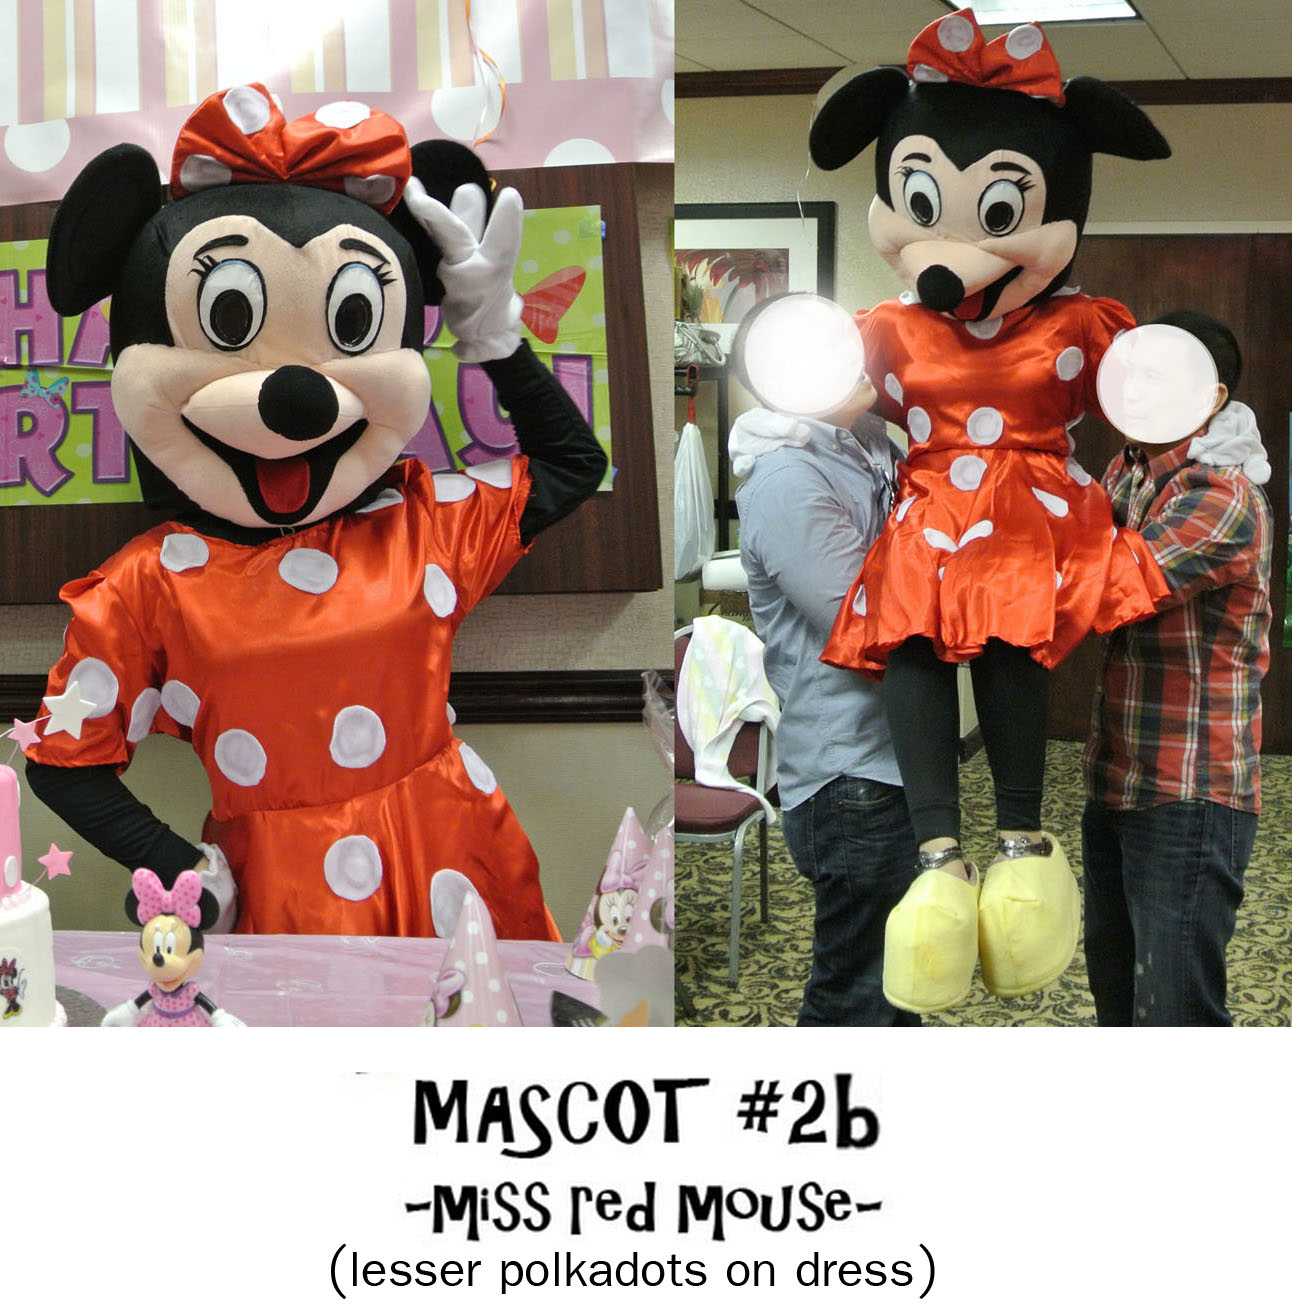 Mascot 2b